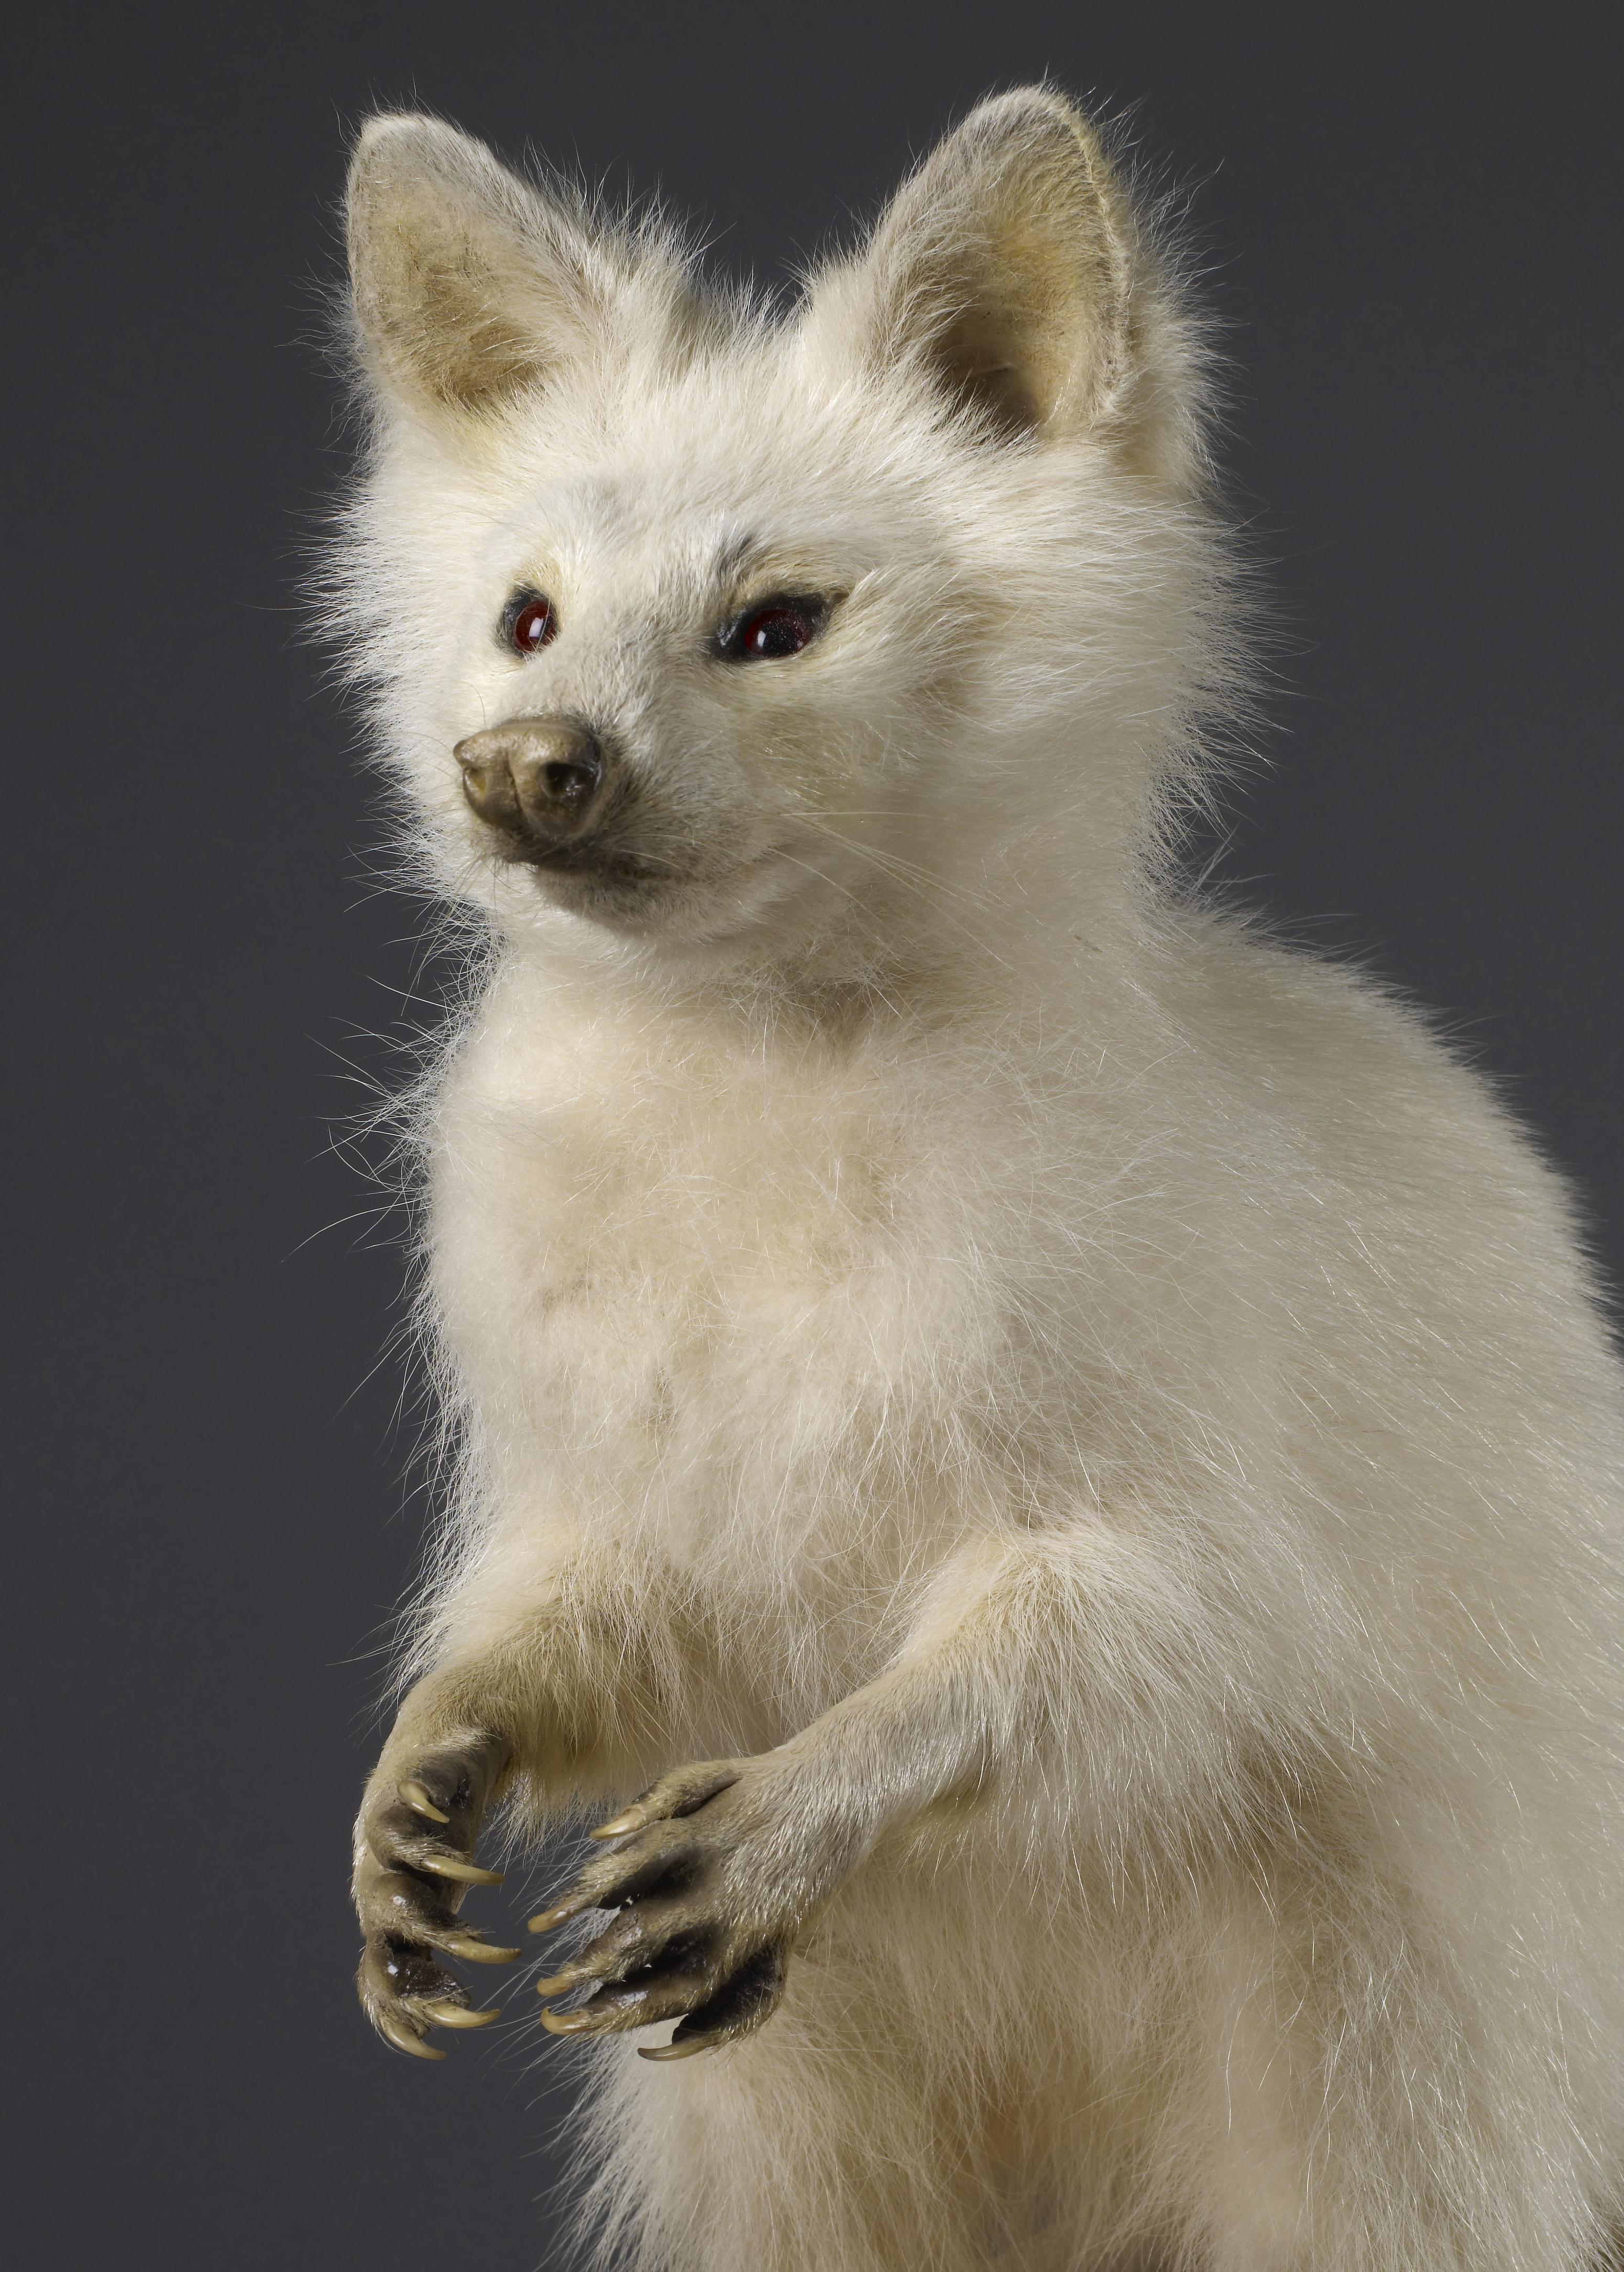 albino-racoon-original